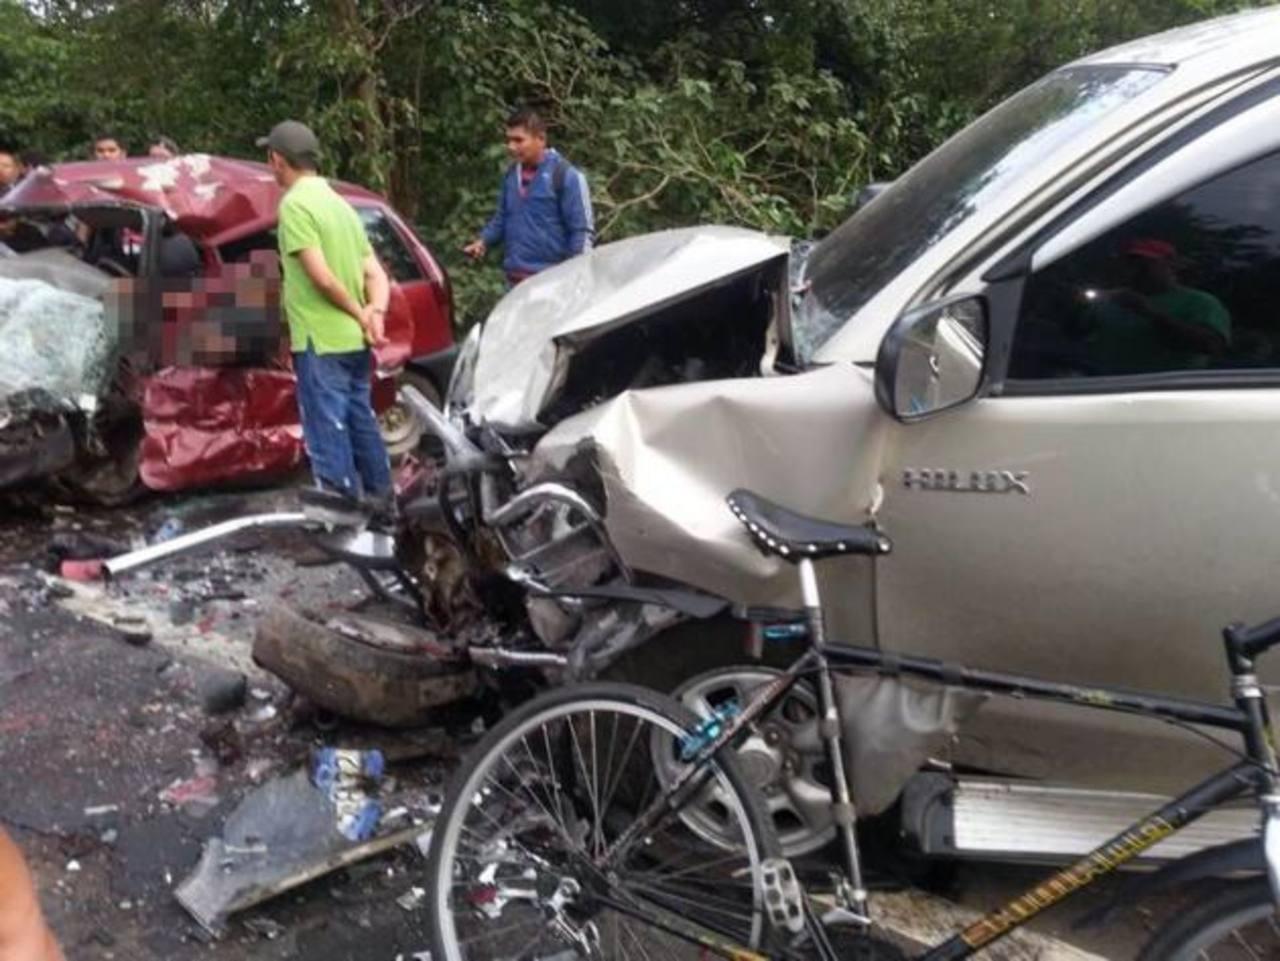 El percance se registró en el kilómetro 66 de la carretera de Santa Ana hacia Chalchuapa. Foto EDH / Usuario Facebook